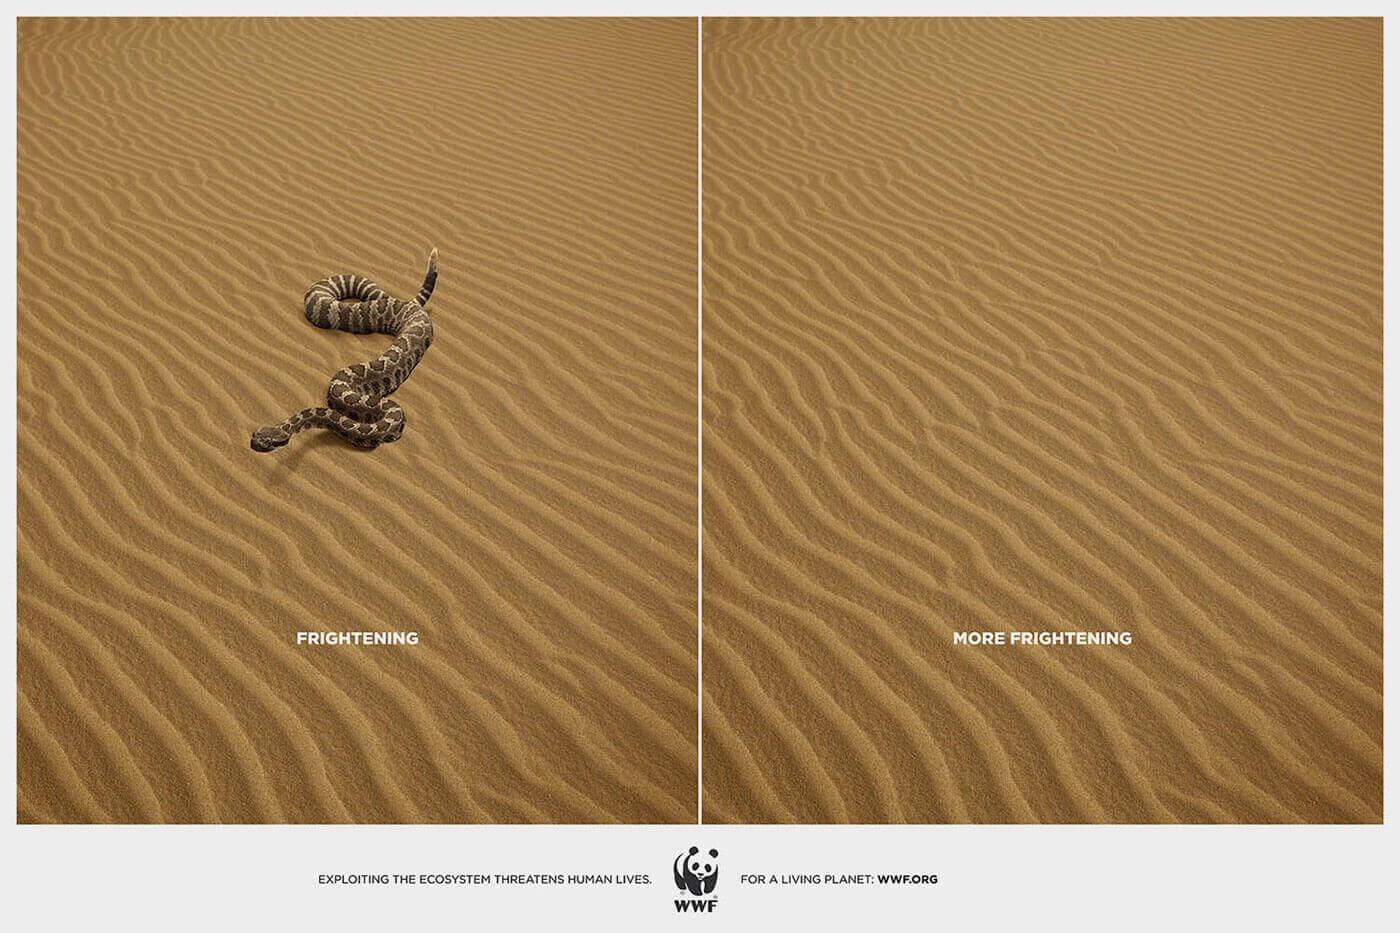 More Frightening – WWF